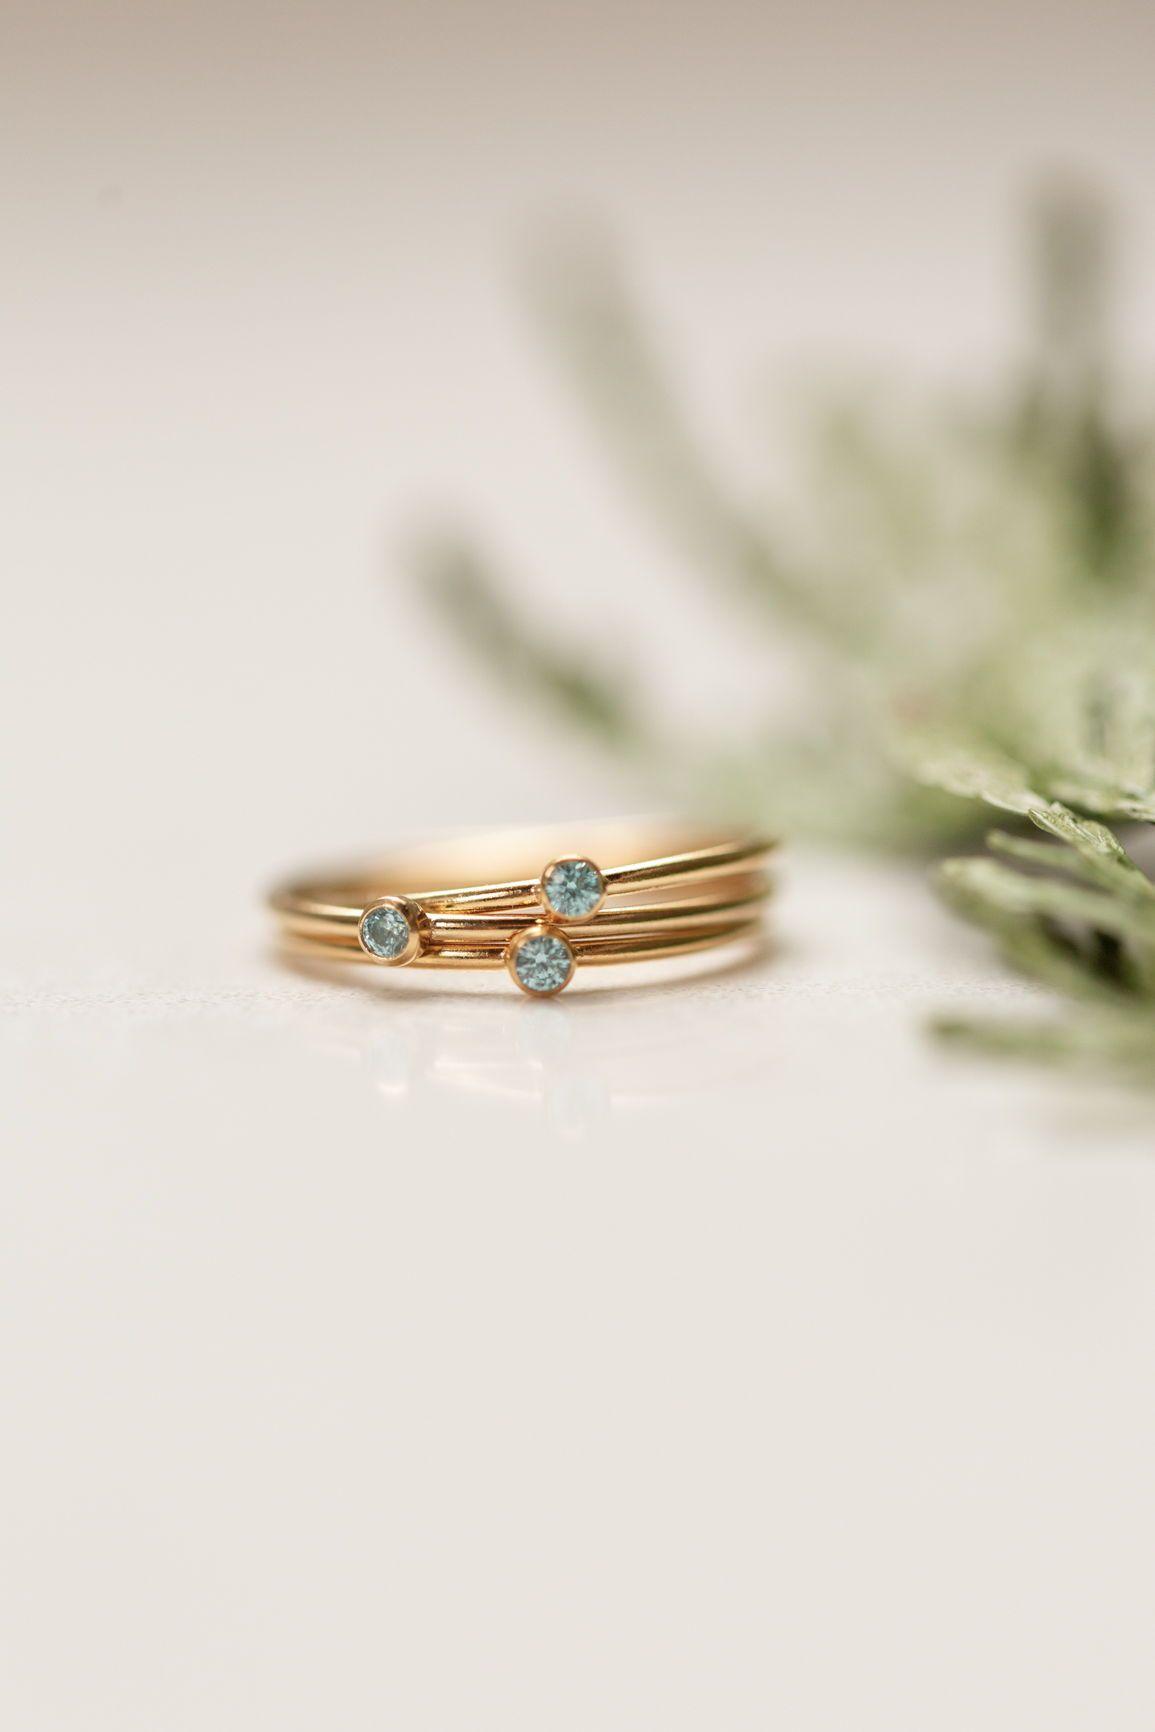 Blue Topaz Ring Gold Ring SALE Round Ring Gemstone Ring Stacking Ring Tiny Ring December Birthstone Ring